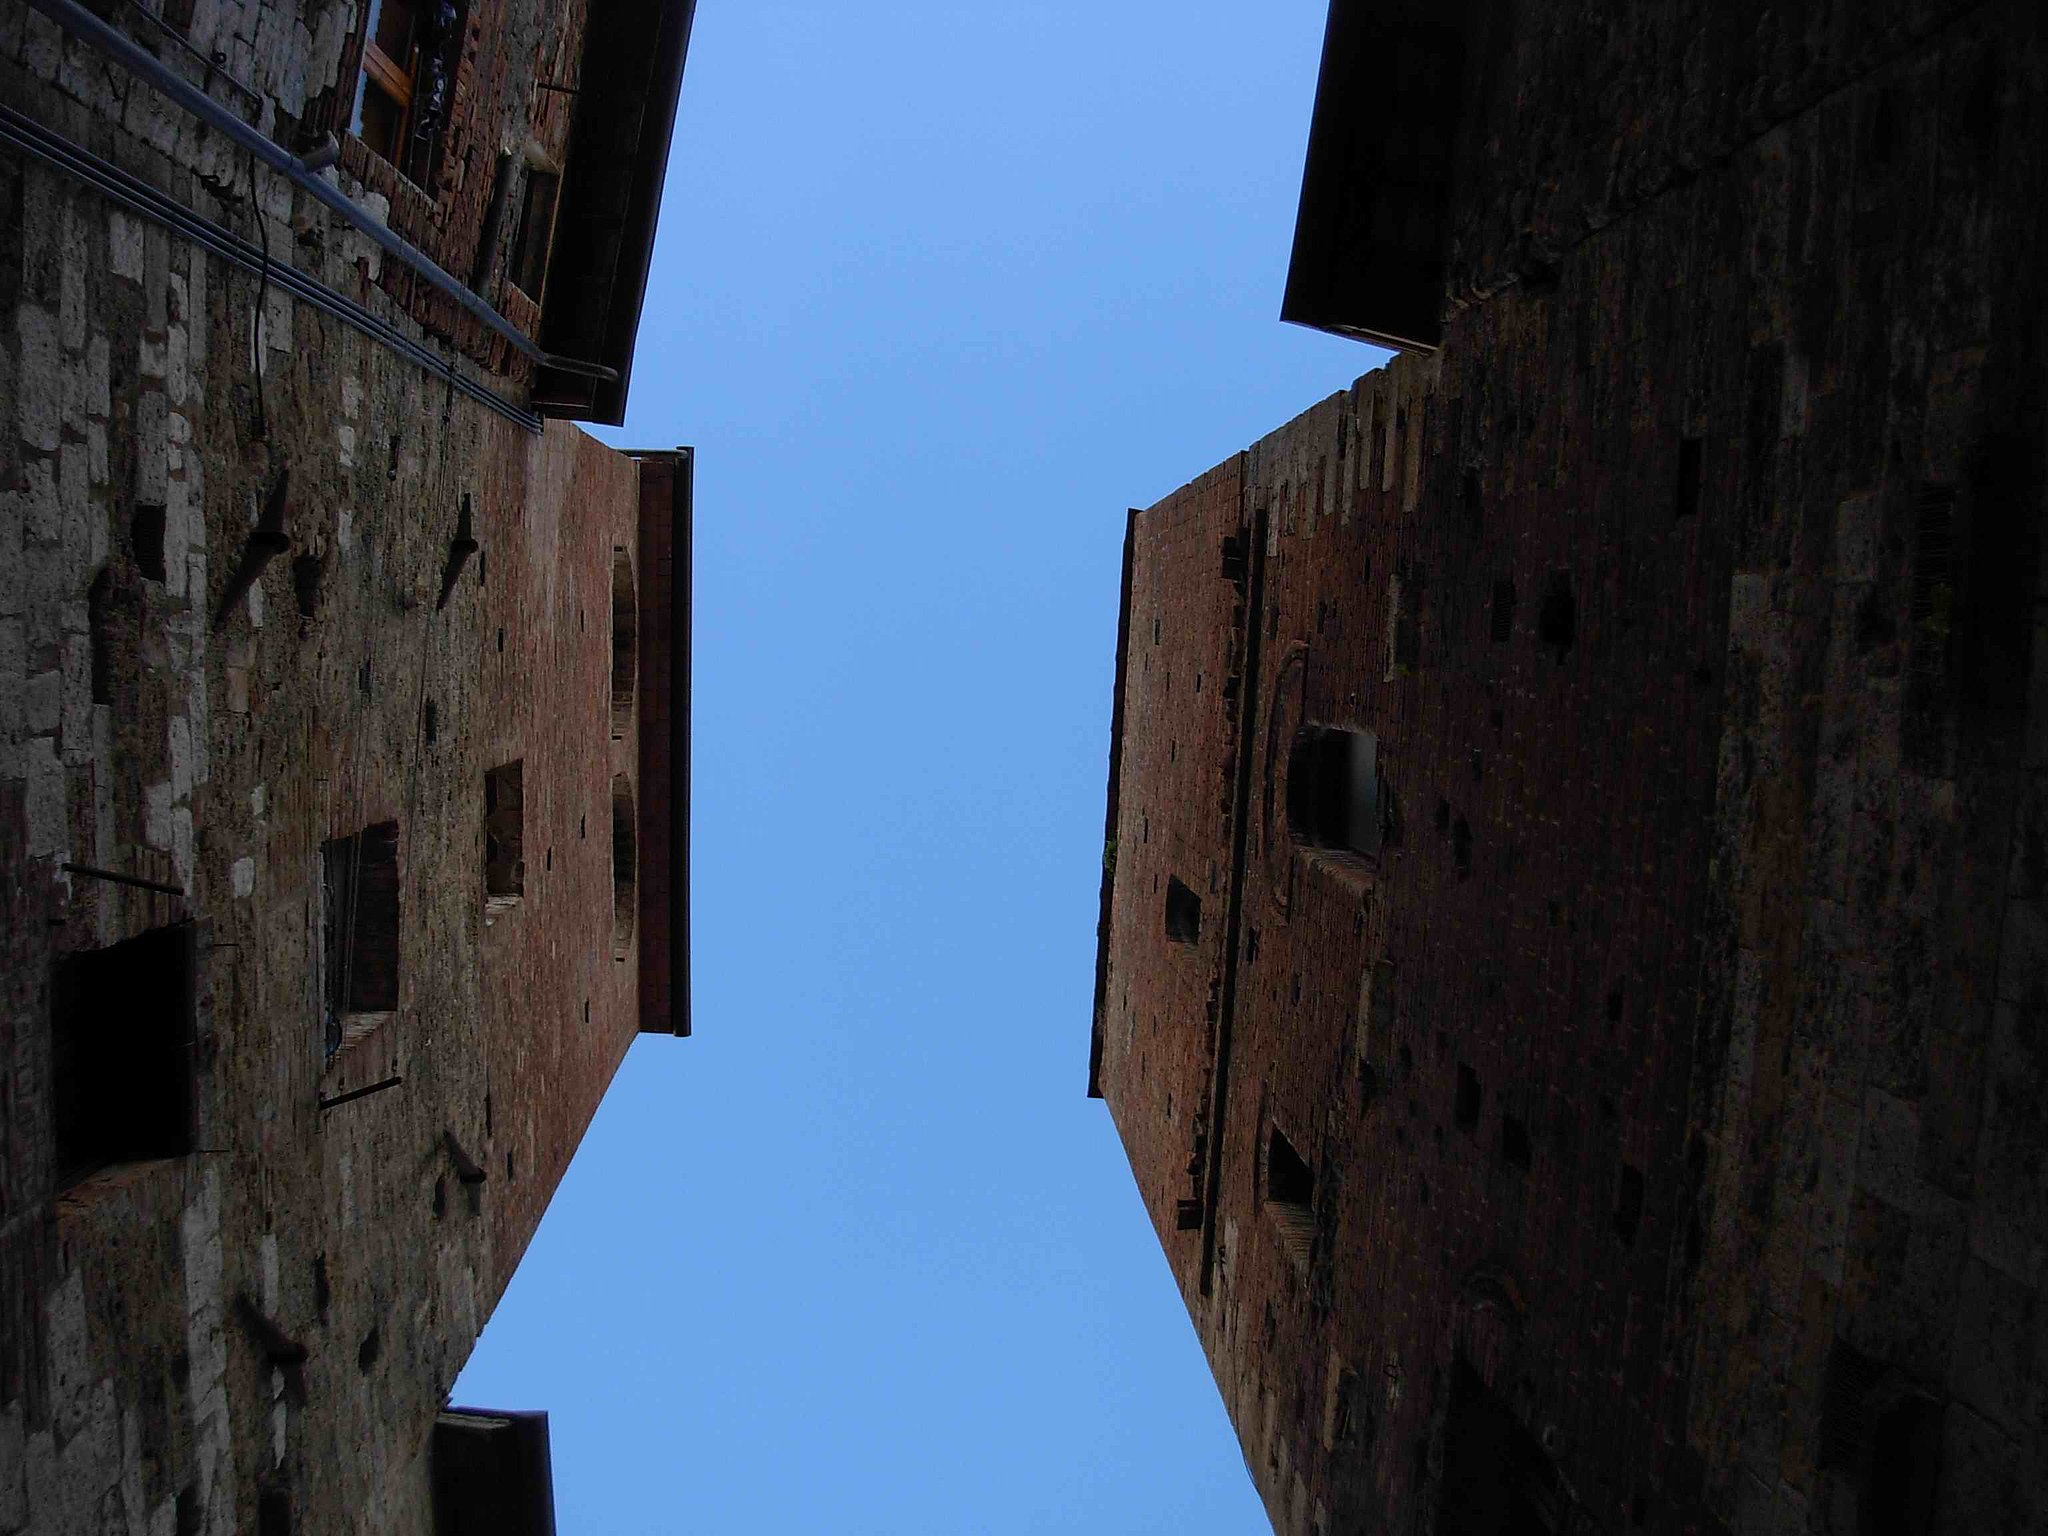 Torre Arnolfo e Pasci